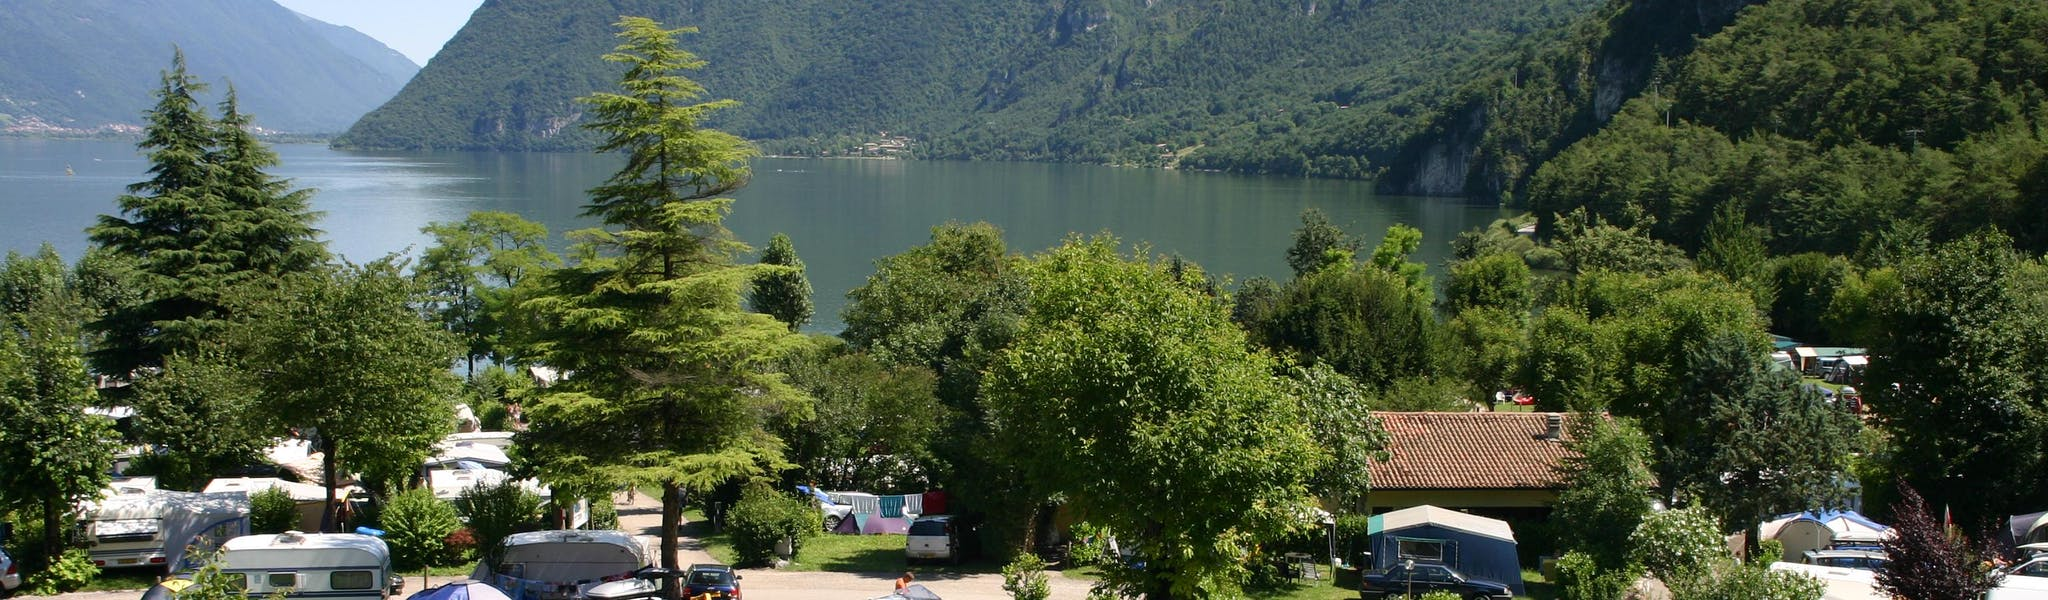 Rio Vantone panorama foto